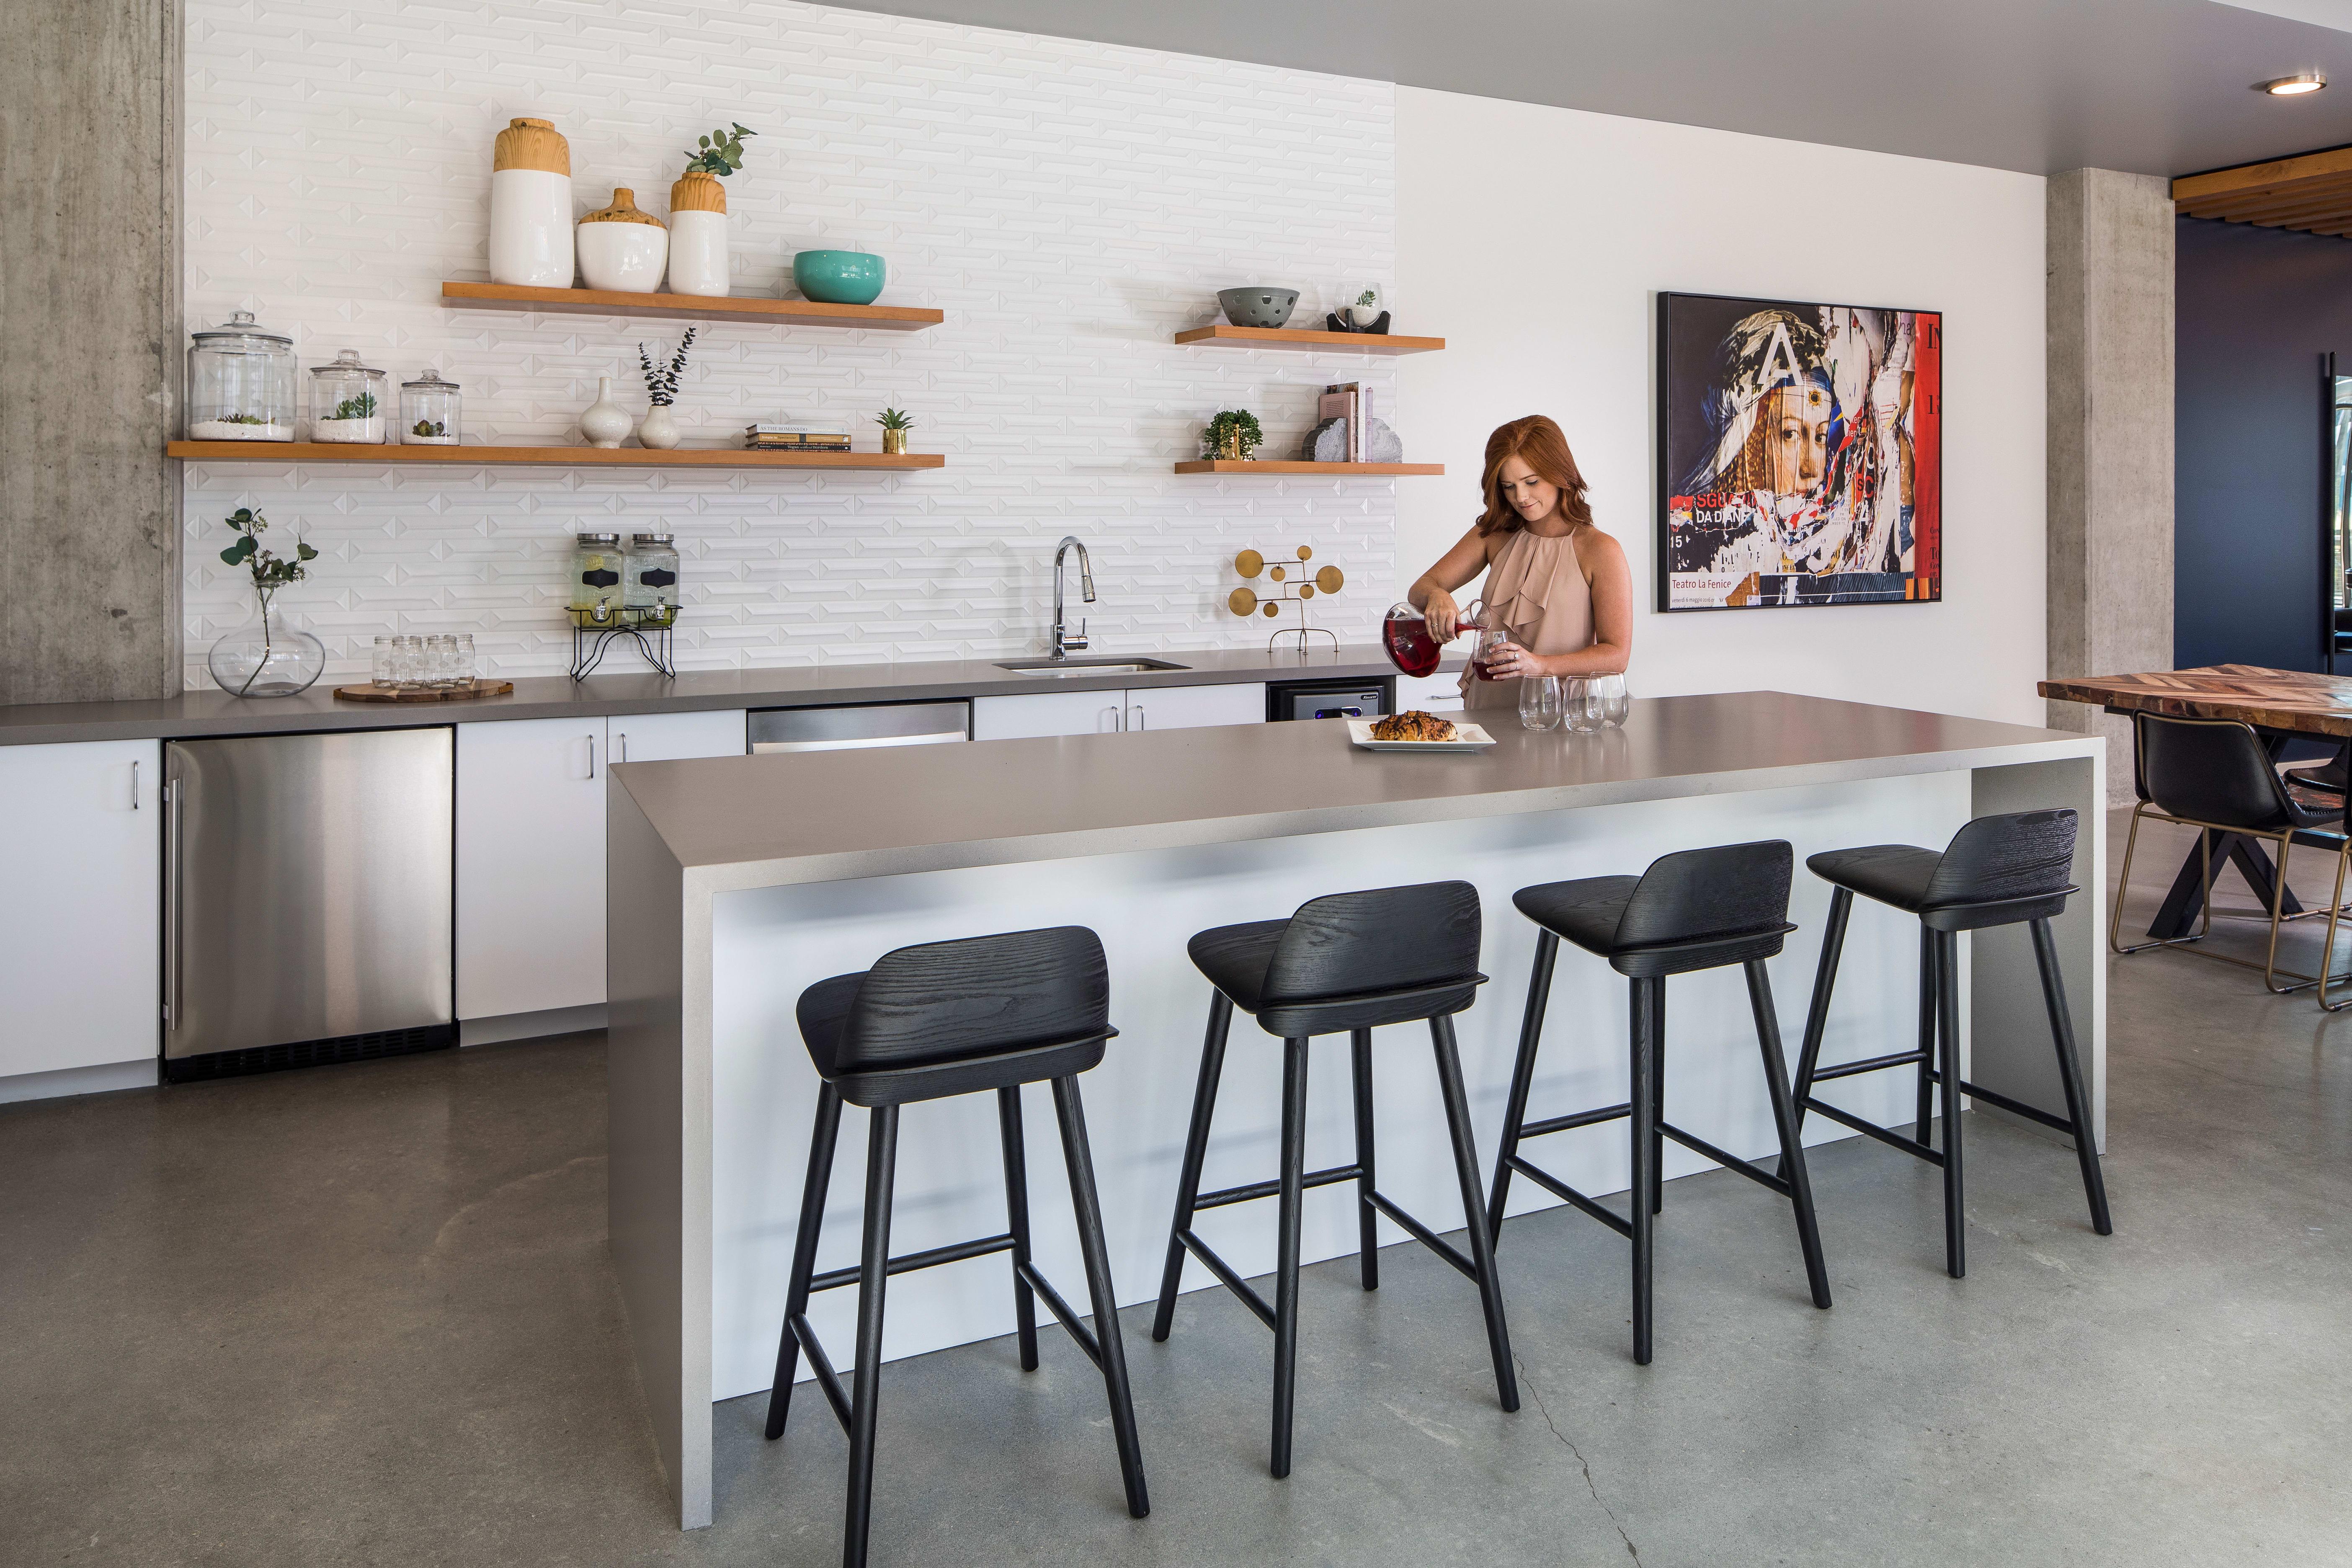 Luxury kitchen at Grant Park Village in Portland, Oregon